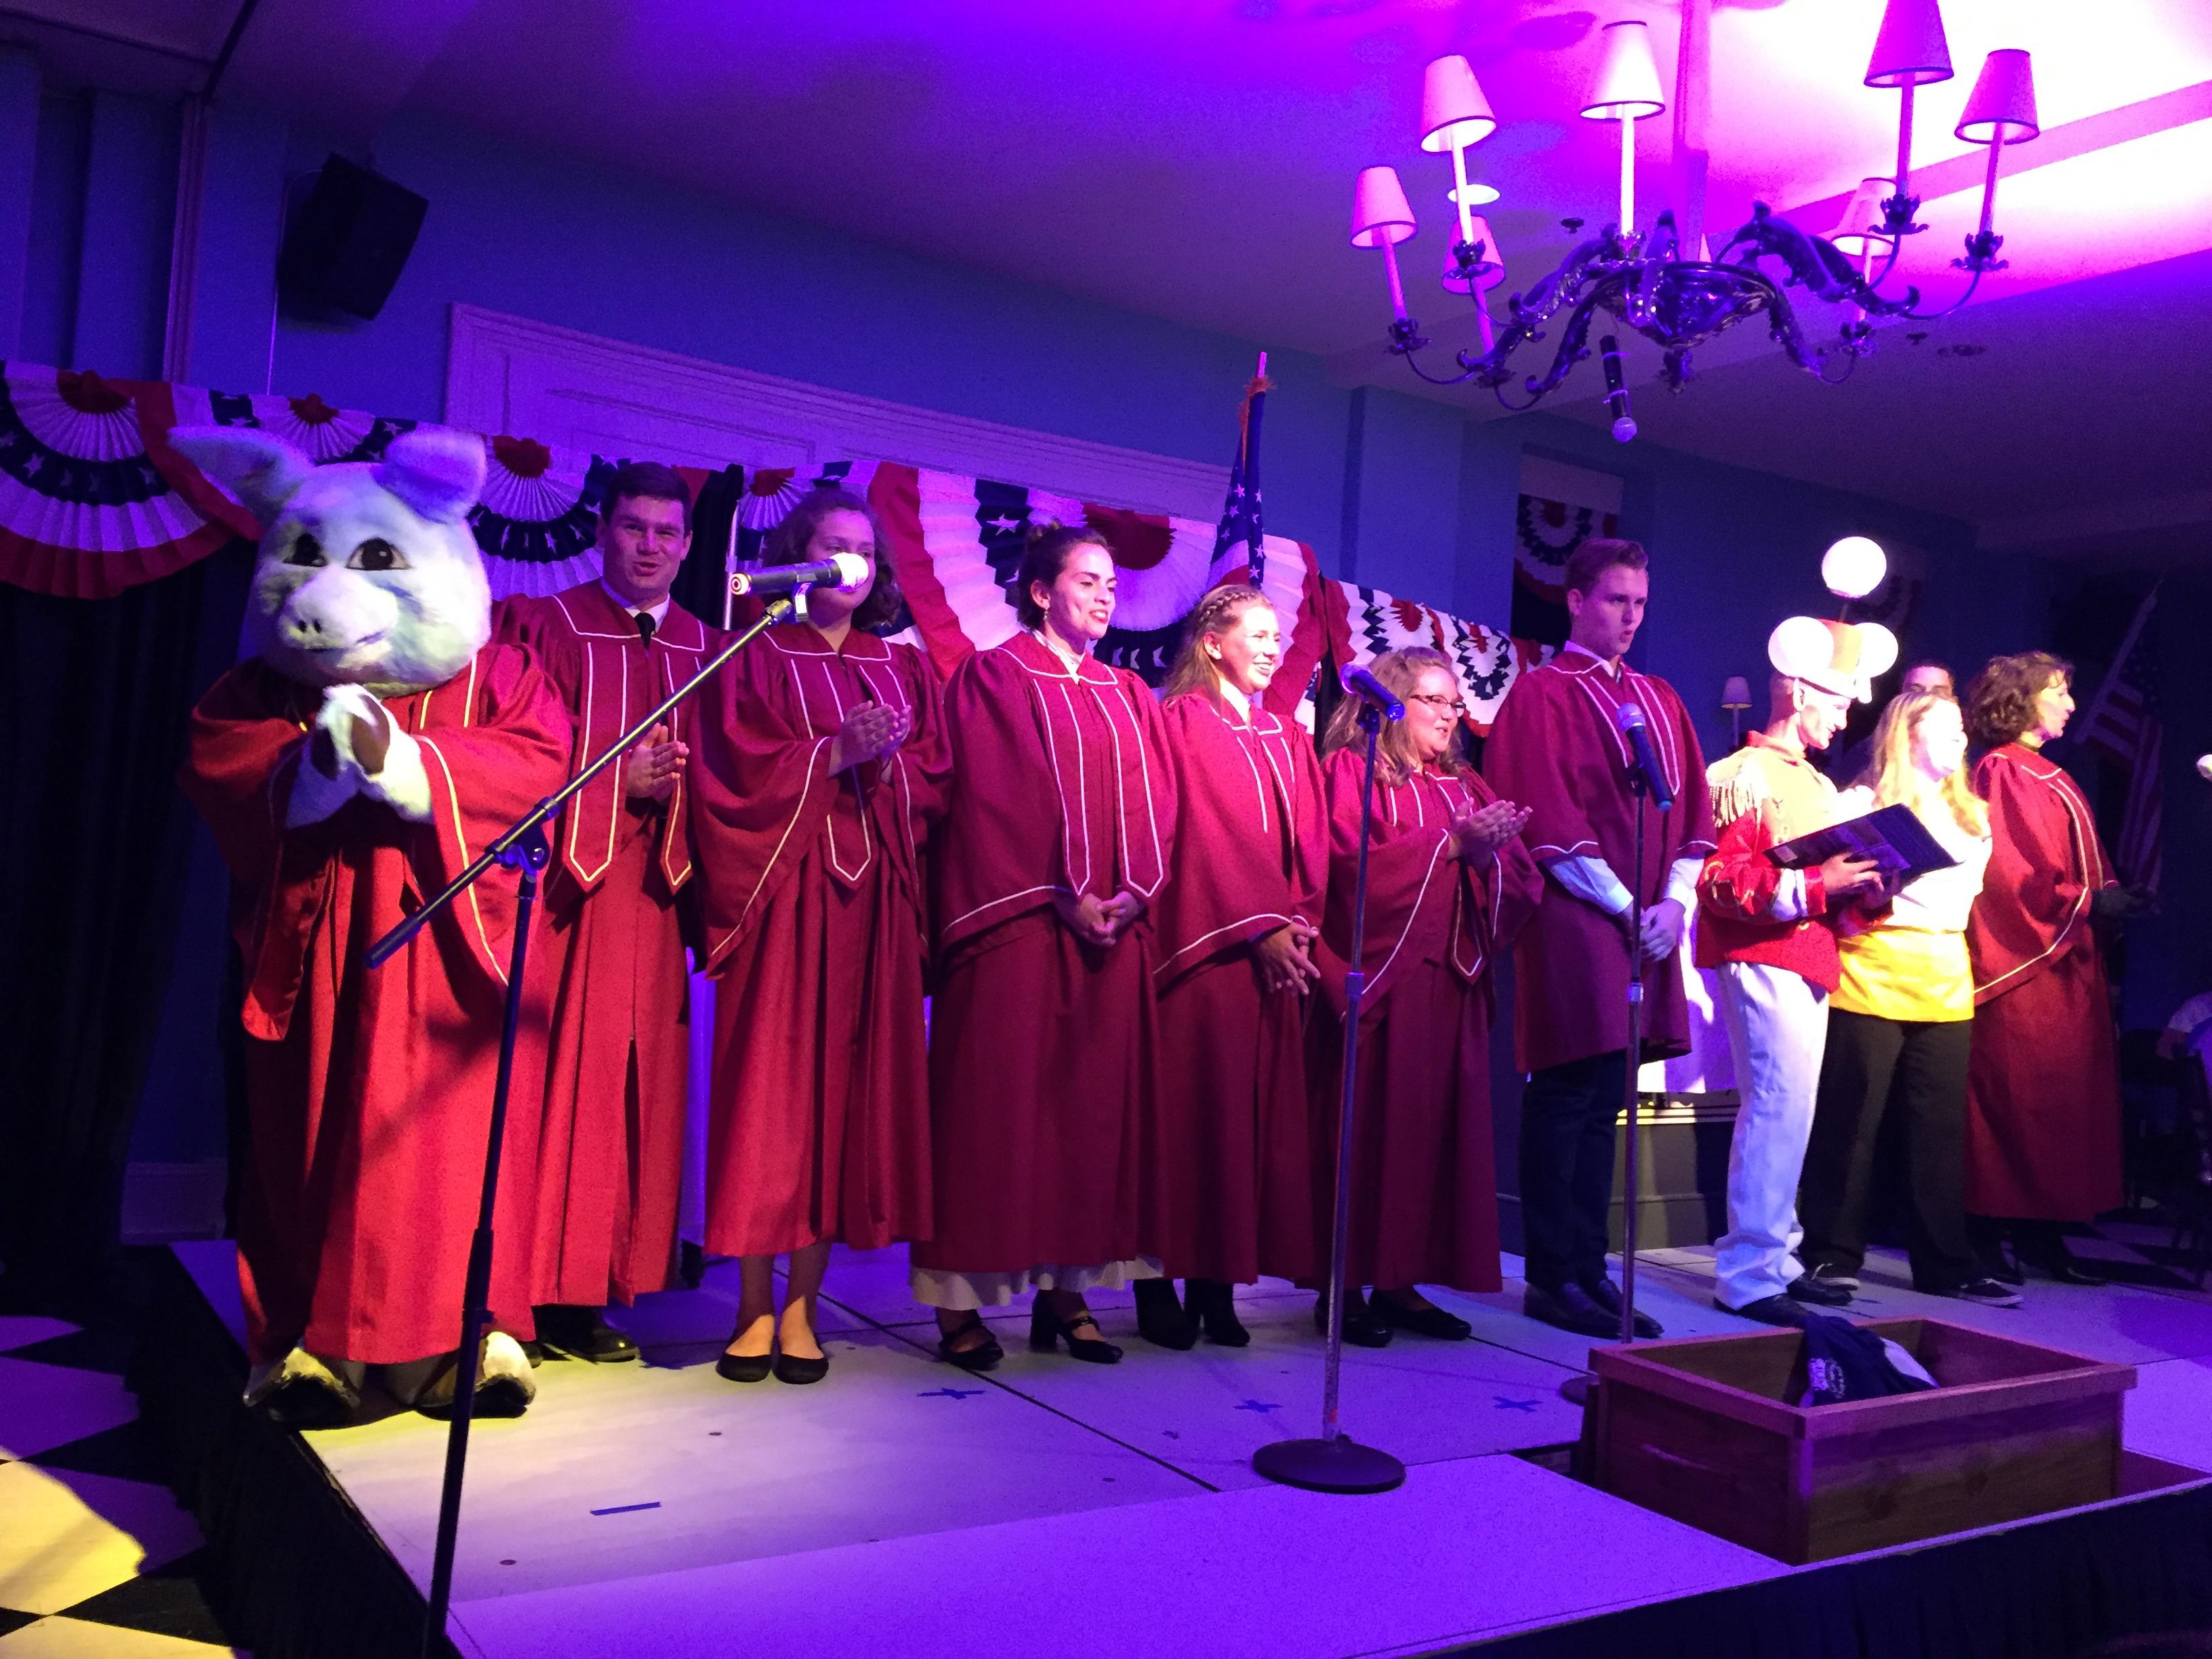 Blue the Pig in choir robes